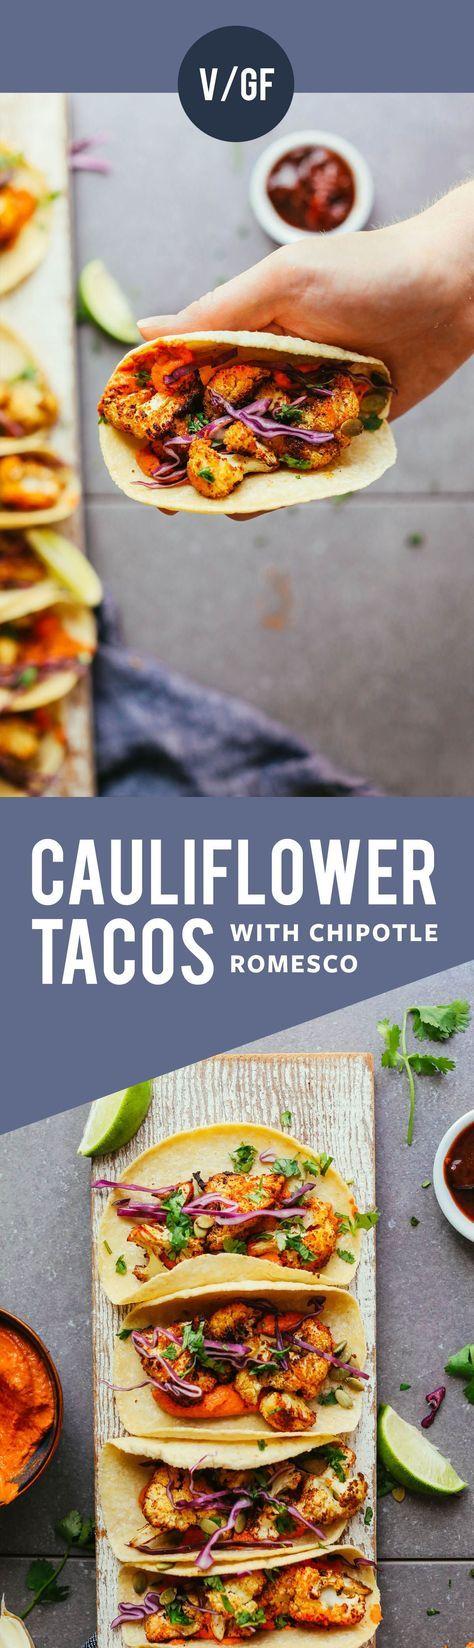 DELICIOUS Roasted Cauliflower Tacos with Adobo Romesco! 30 min, healthy,- Minimalist Baker